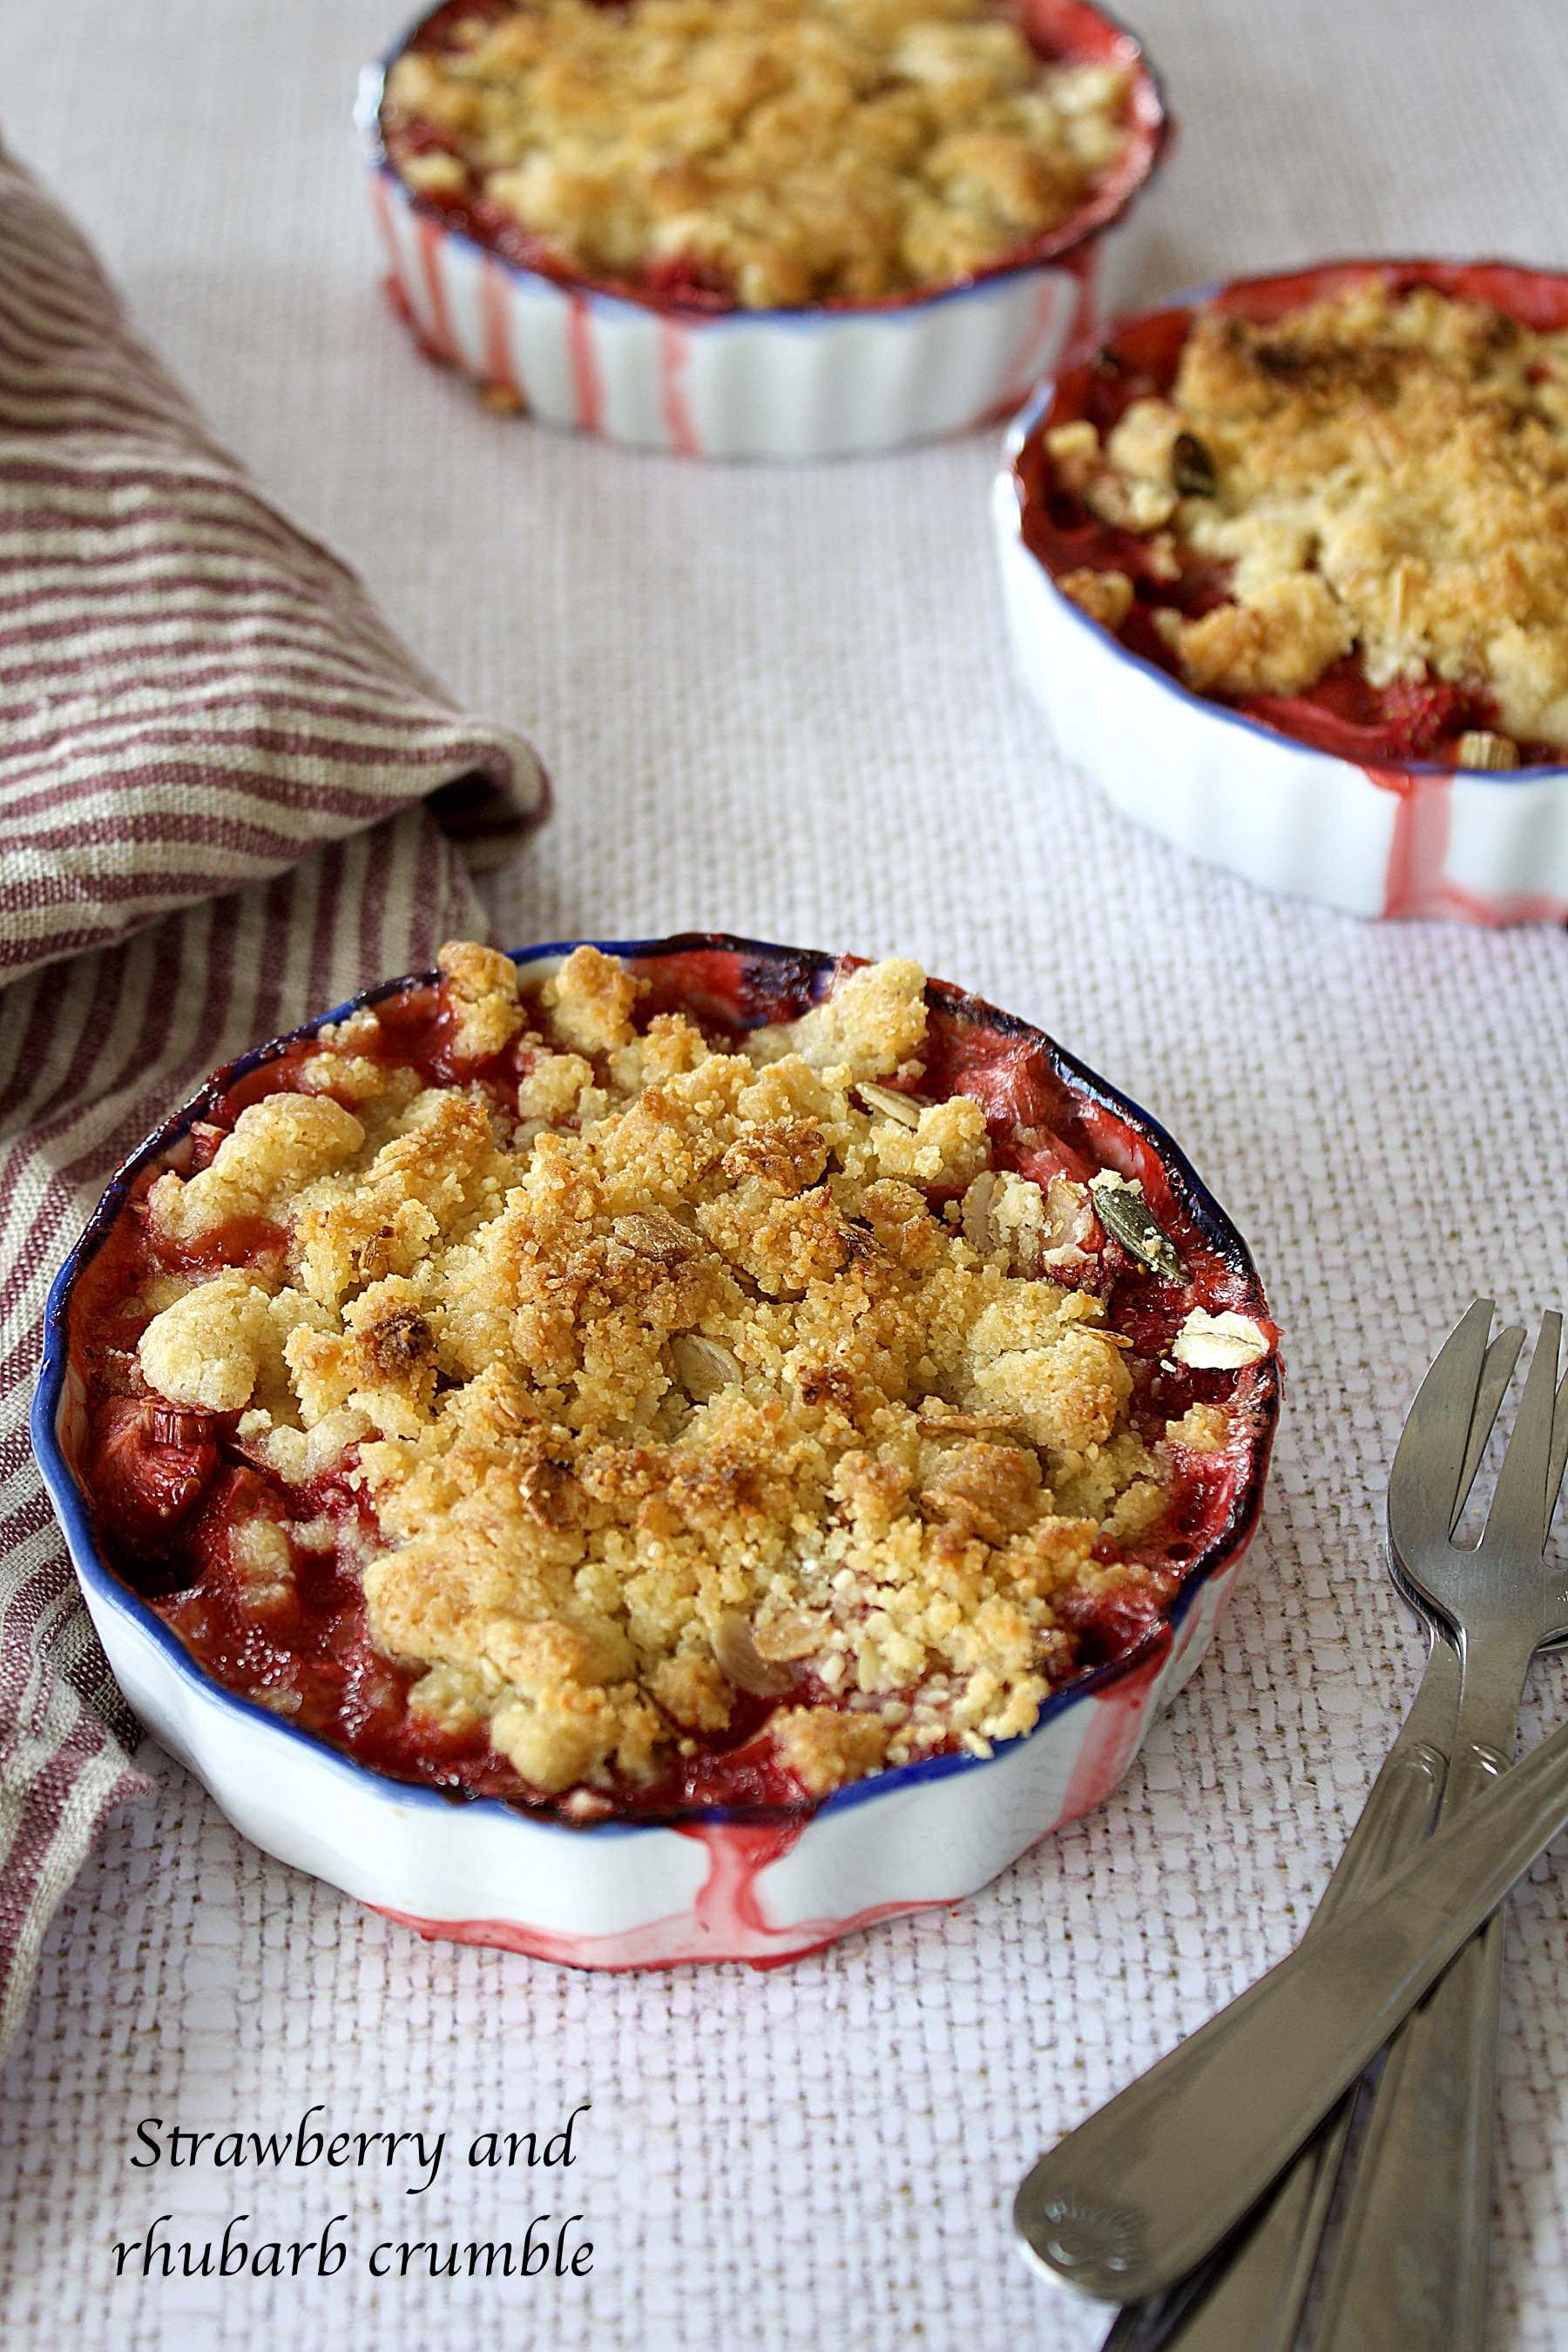 Strawberry and rhubarb crumble